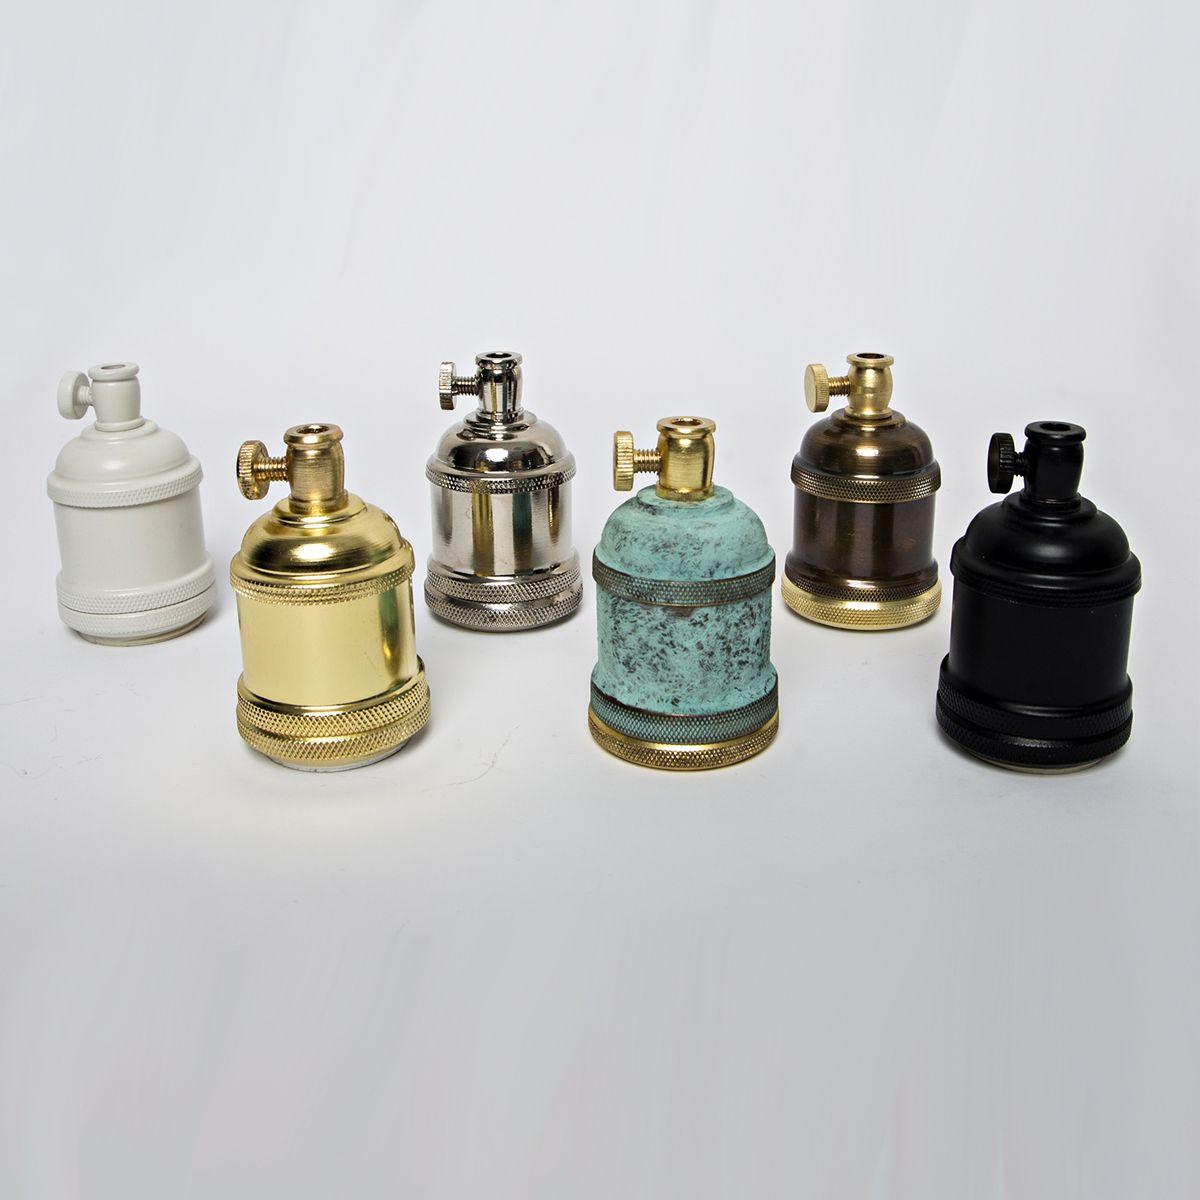 Комплектующие: лампочки, провод, патрон